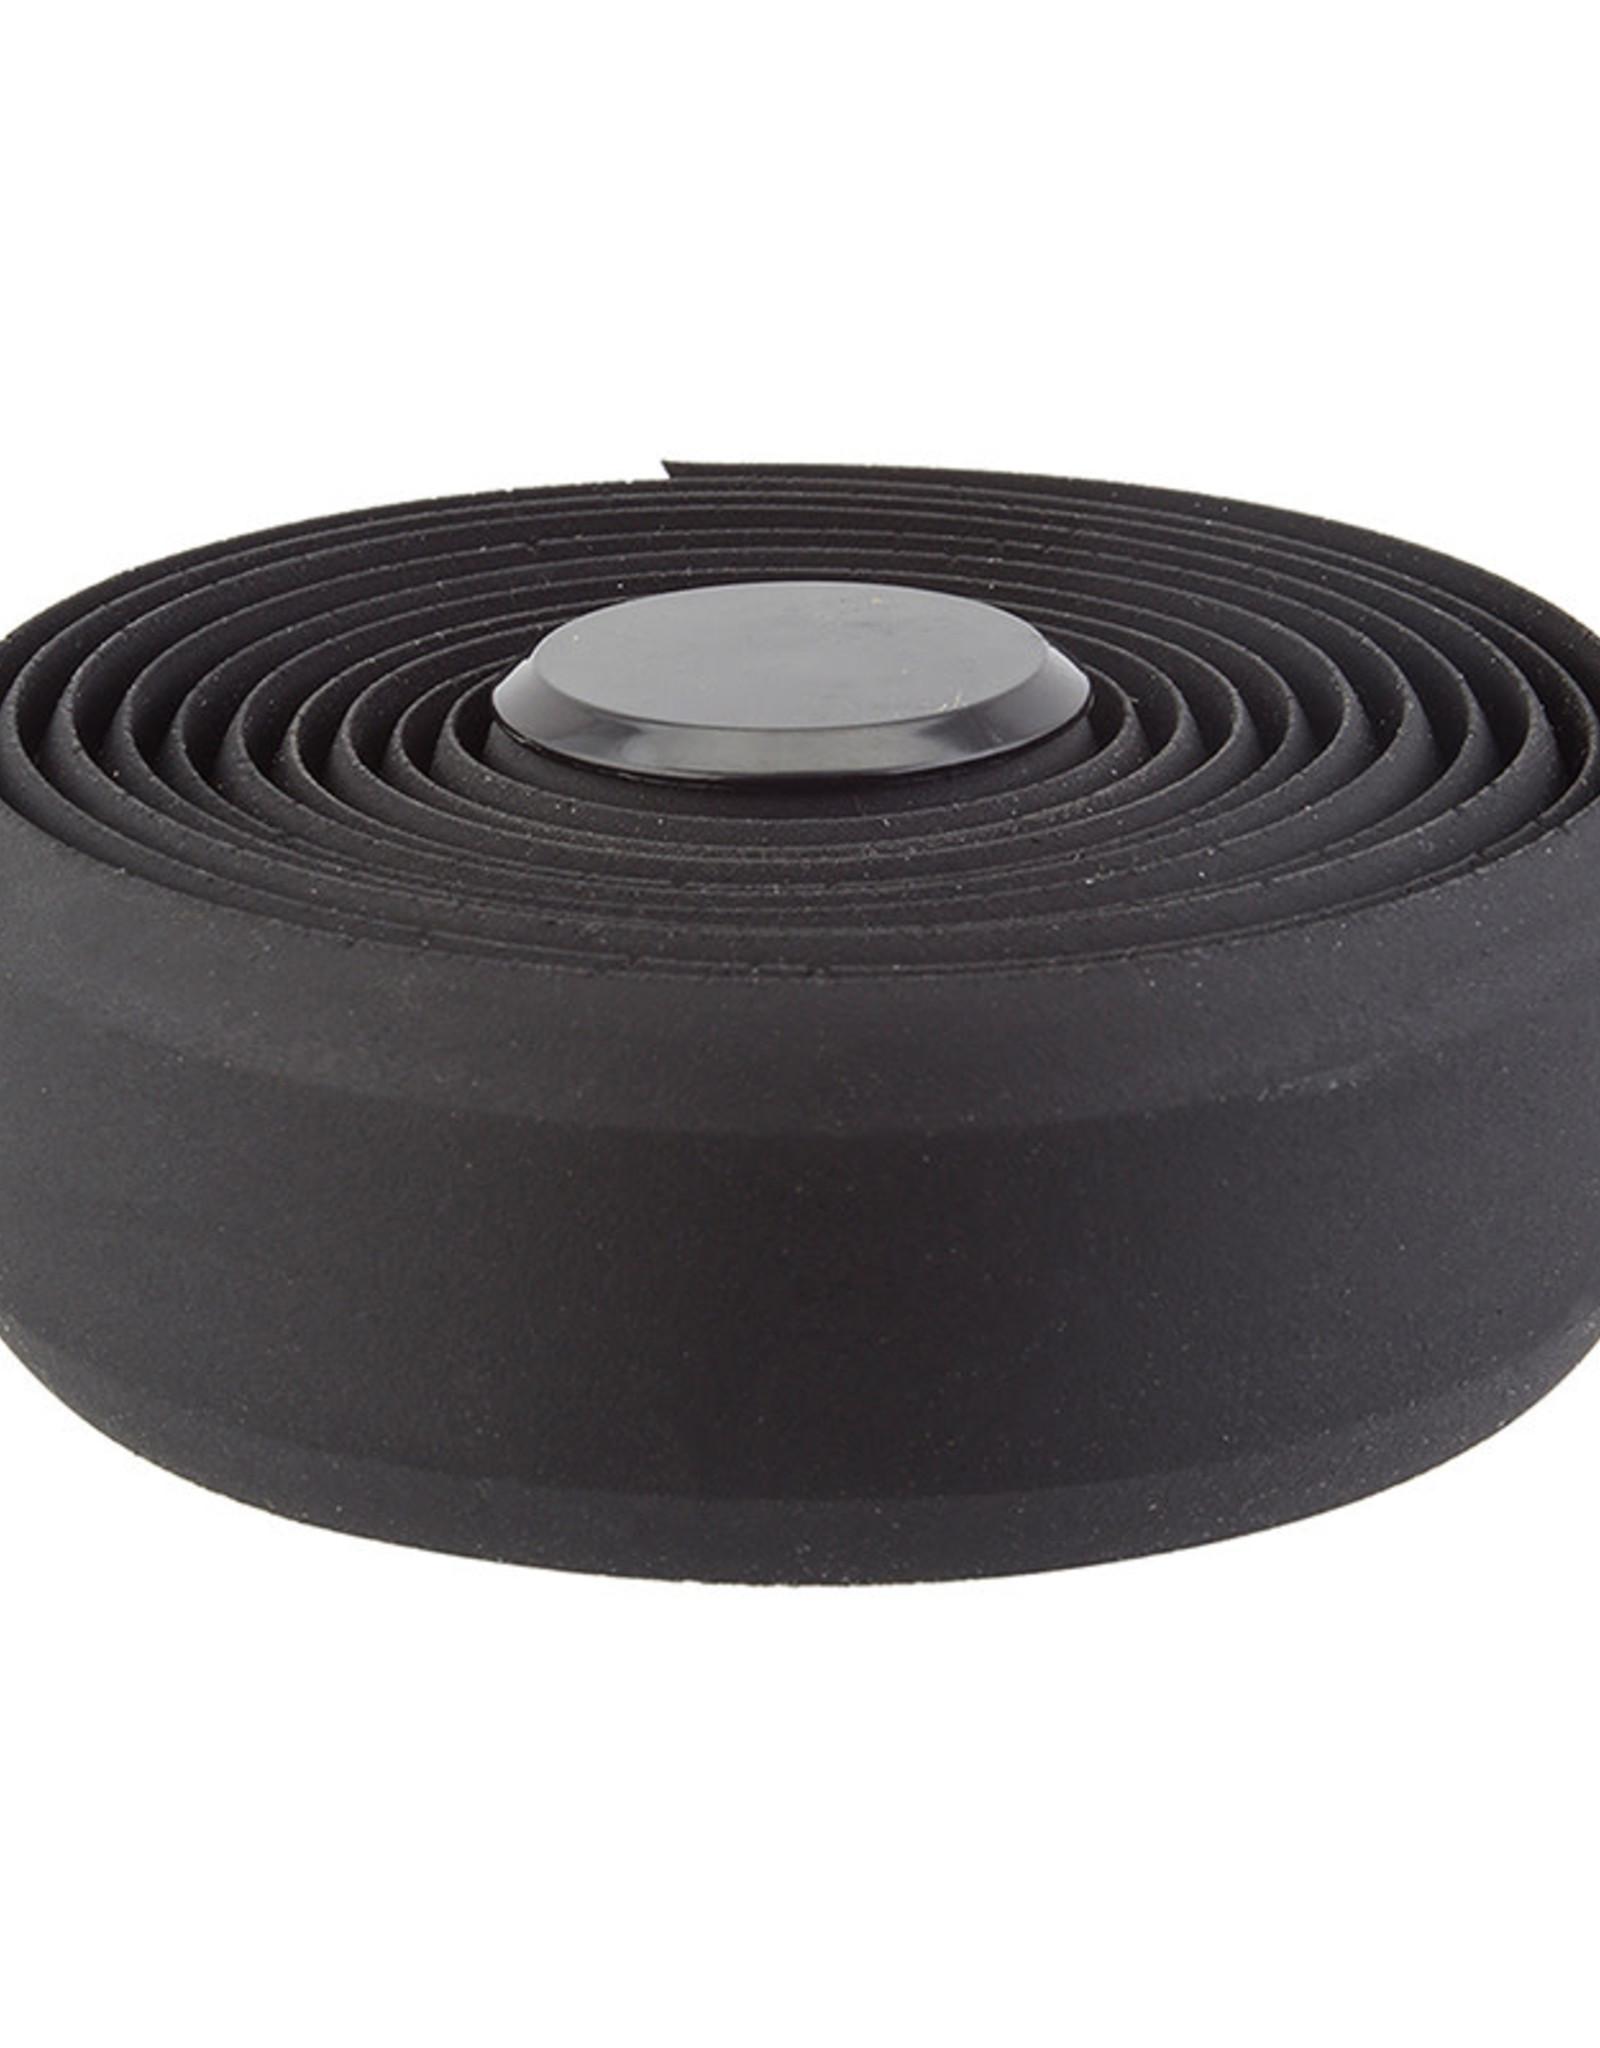 MR TUFFY Mr Tuffy Amazing Black Handlebar Tape